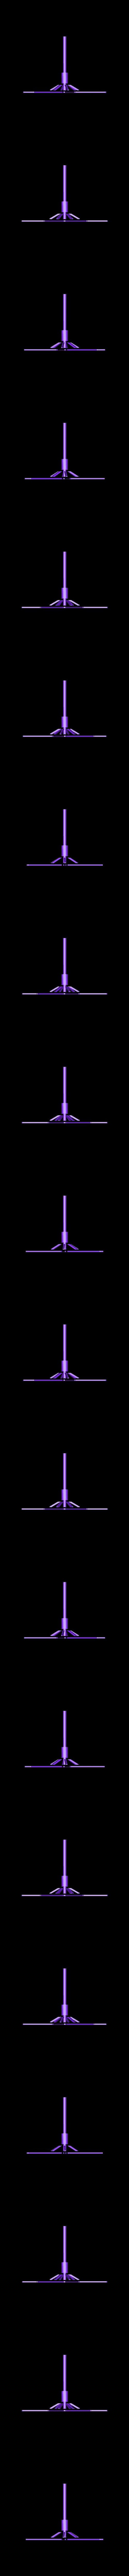 Umbrella_-_Umbrella_ABSUmbrella-1.STL Download free STL file Toy umbrella - collapsible with translucent top • 3D printable template, Cornbald